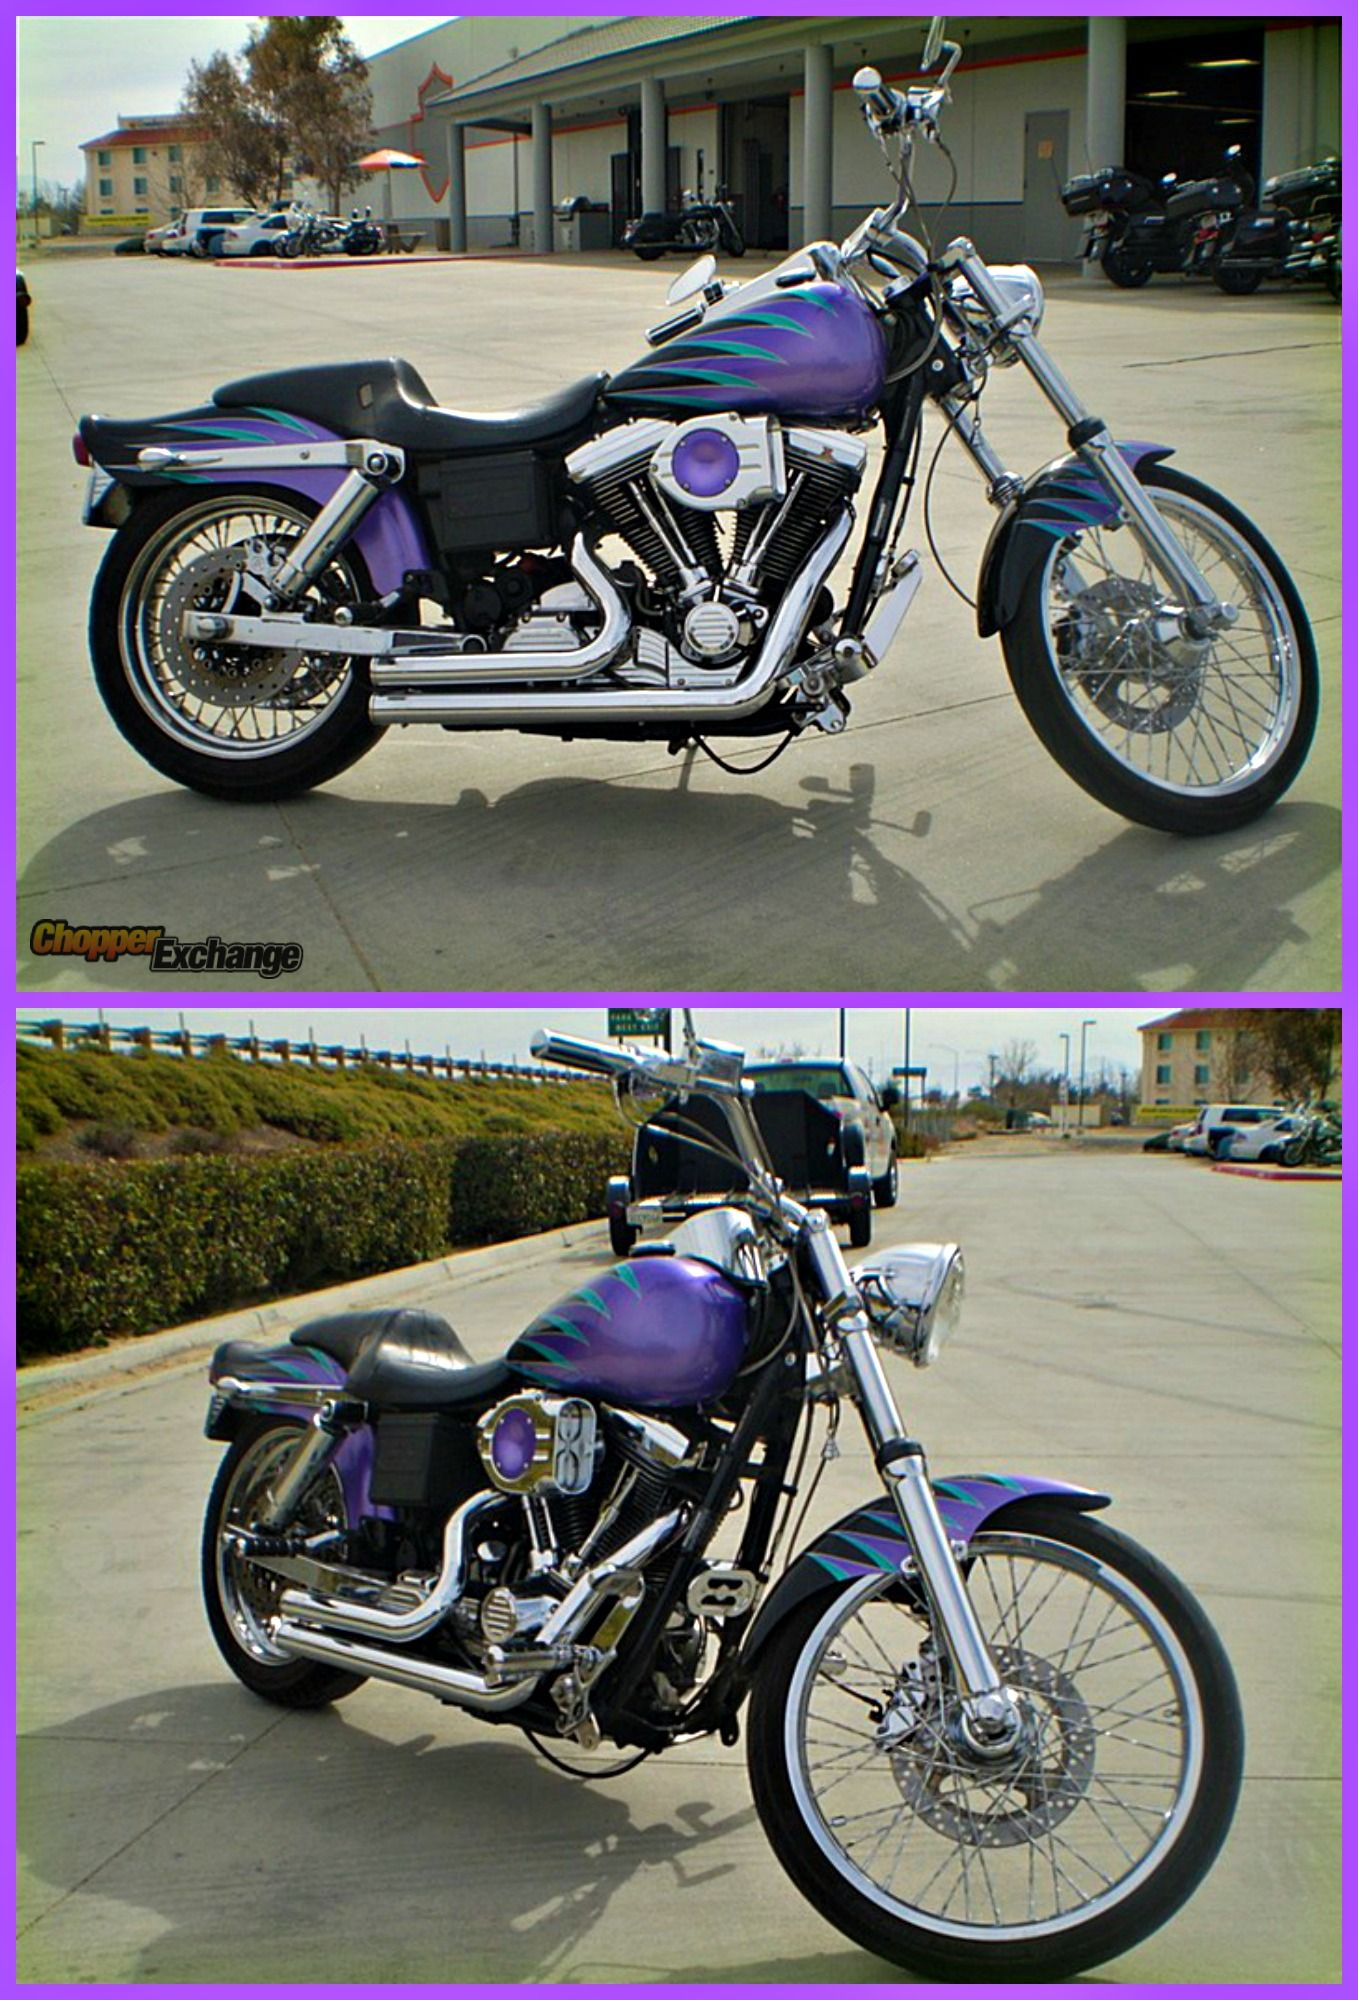 For Sale 1995 Harleydavidson Dyna Wideglide Antelope Valley